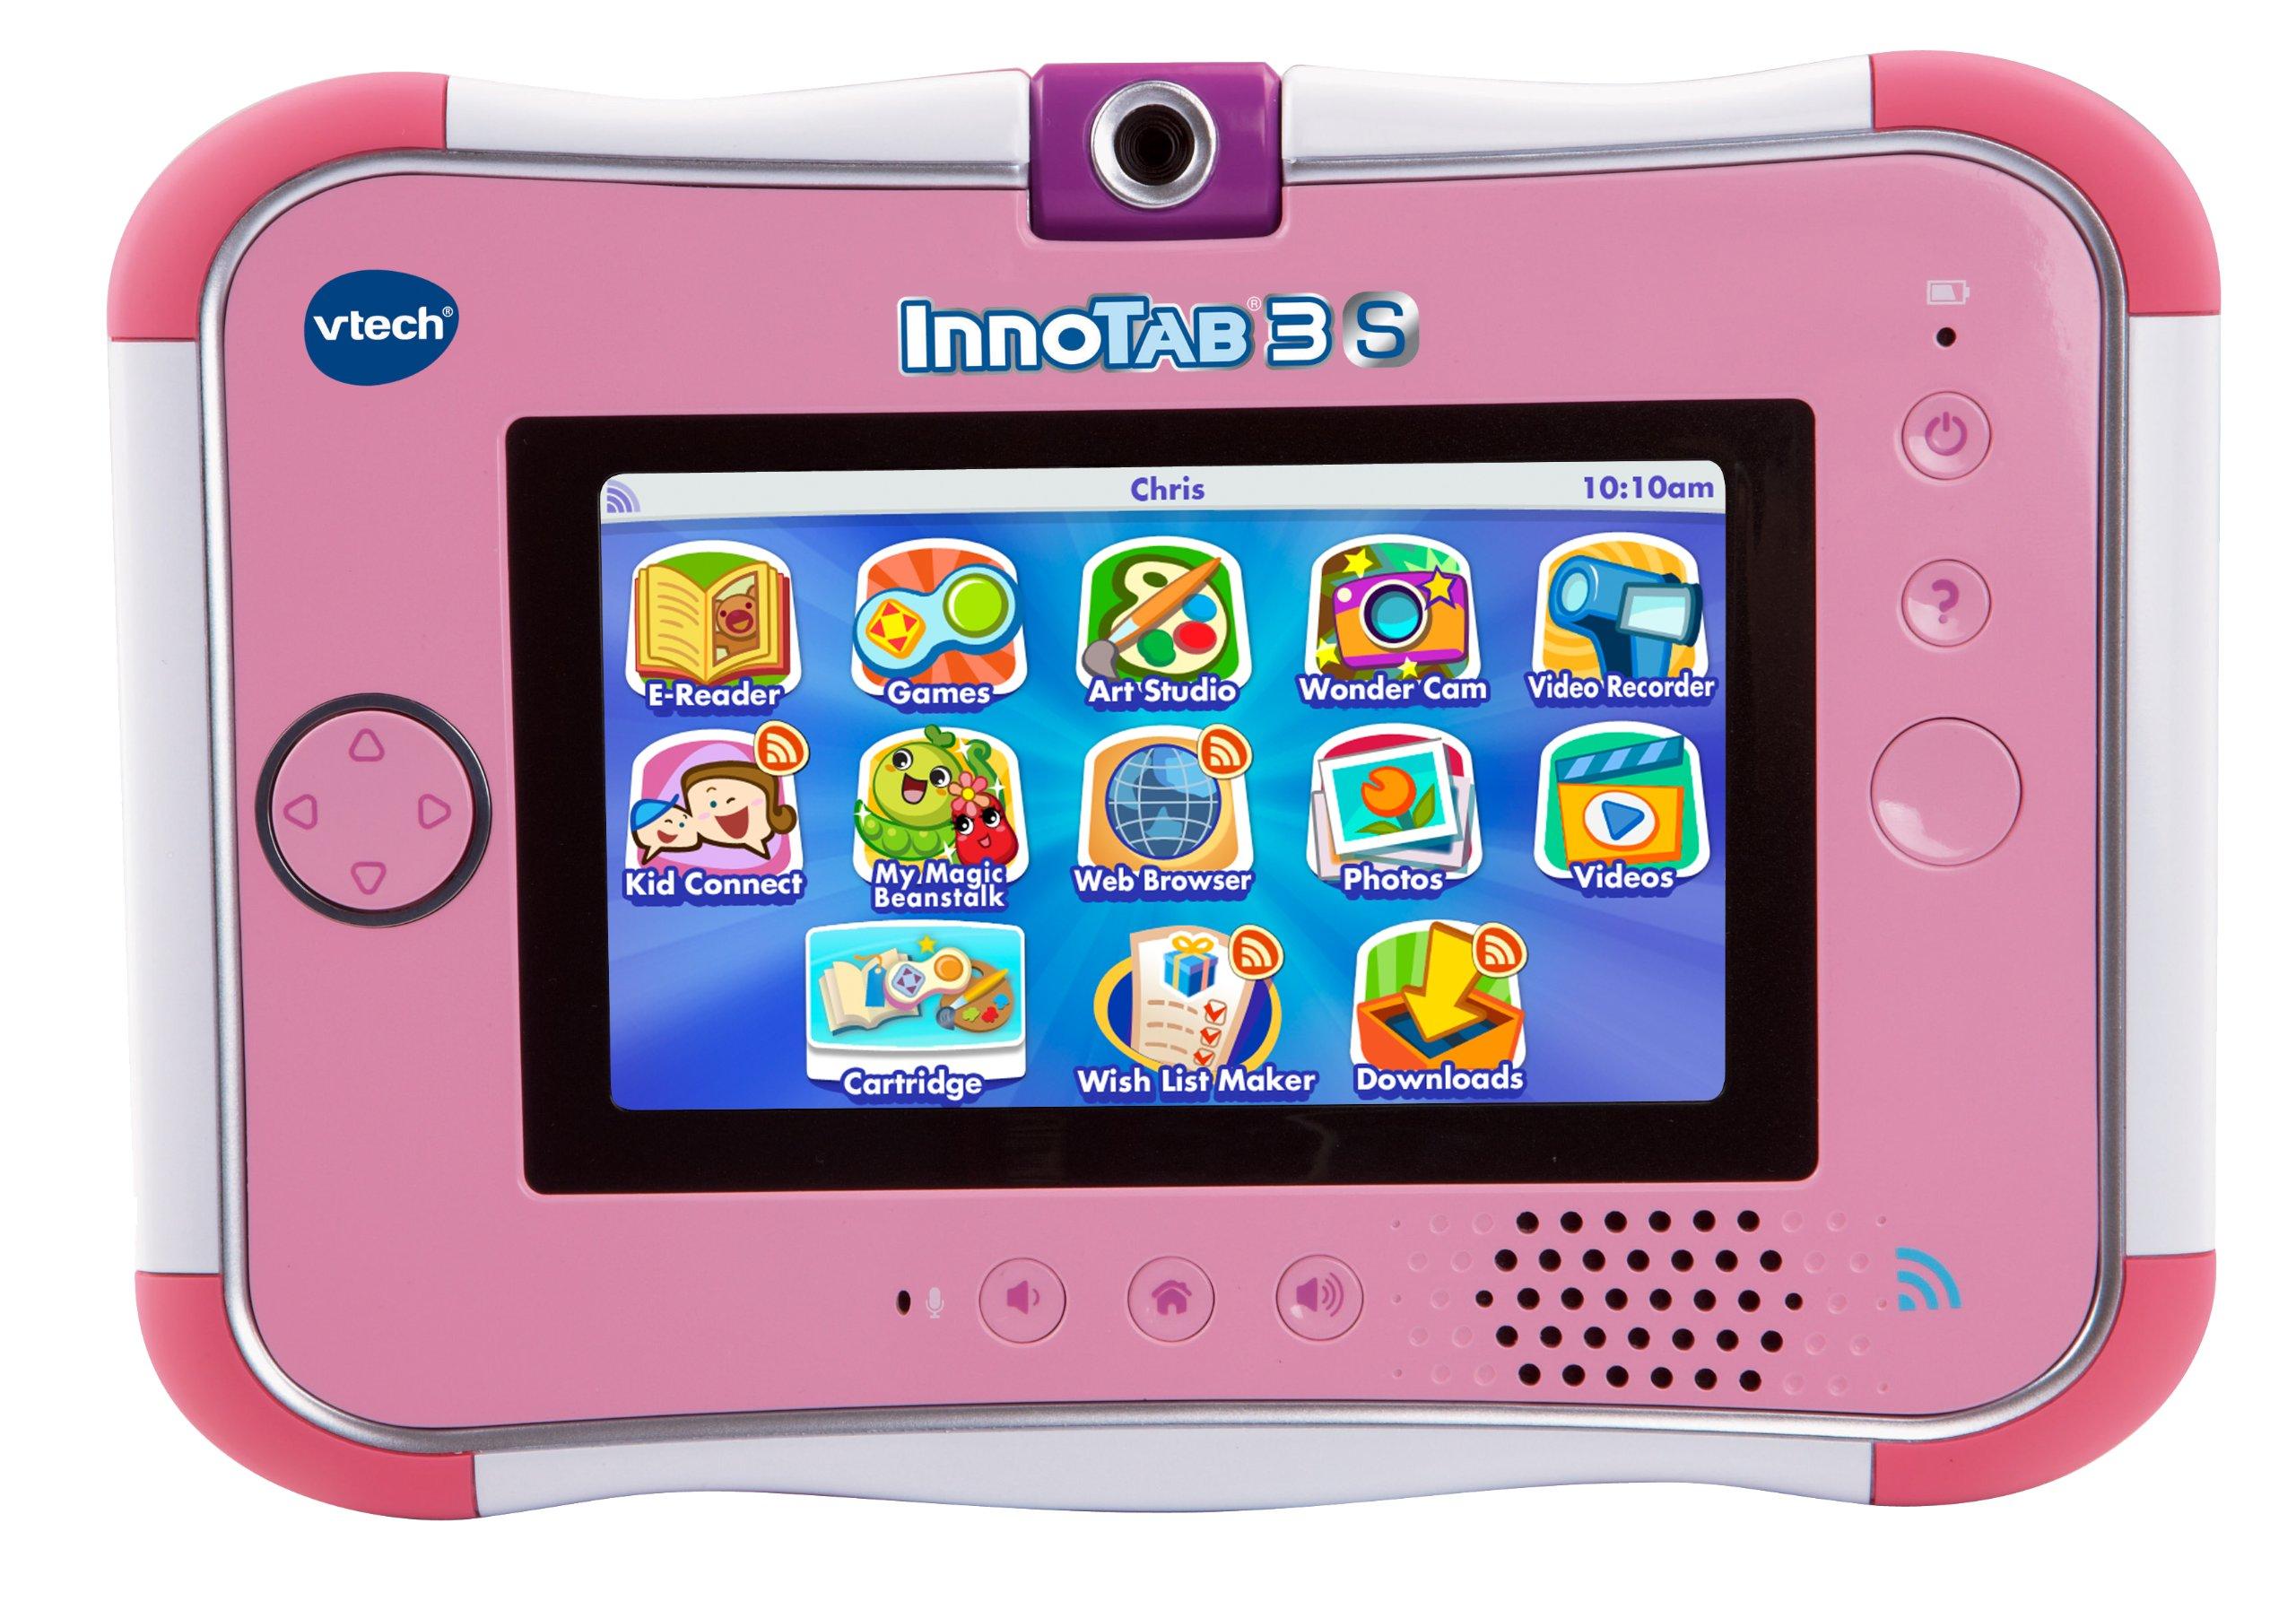 VTech InnoTab 3S Kids Tablet, Pink by VTech (Image #1)